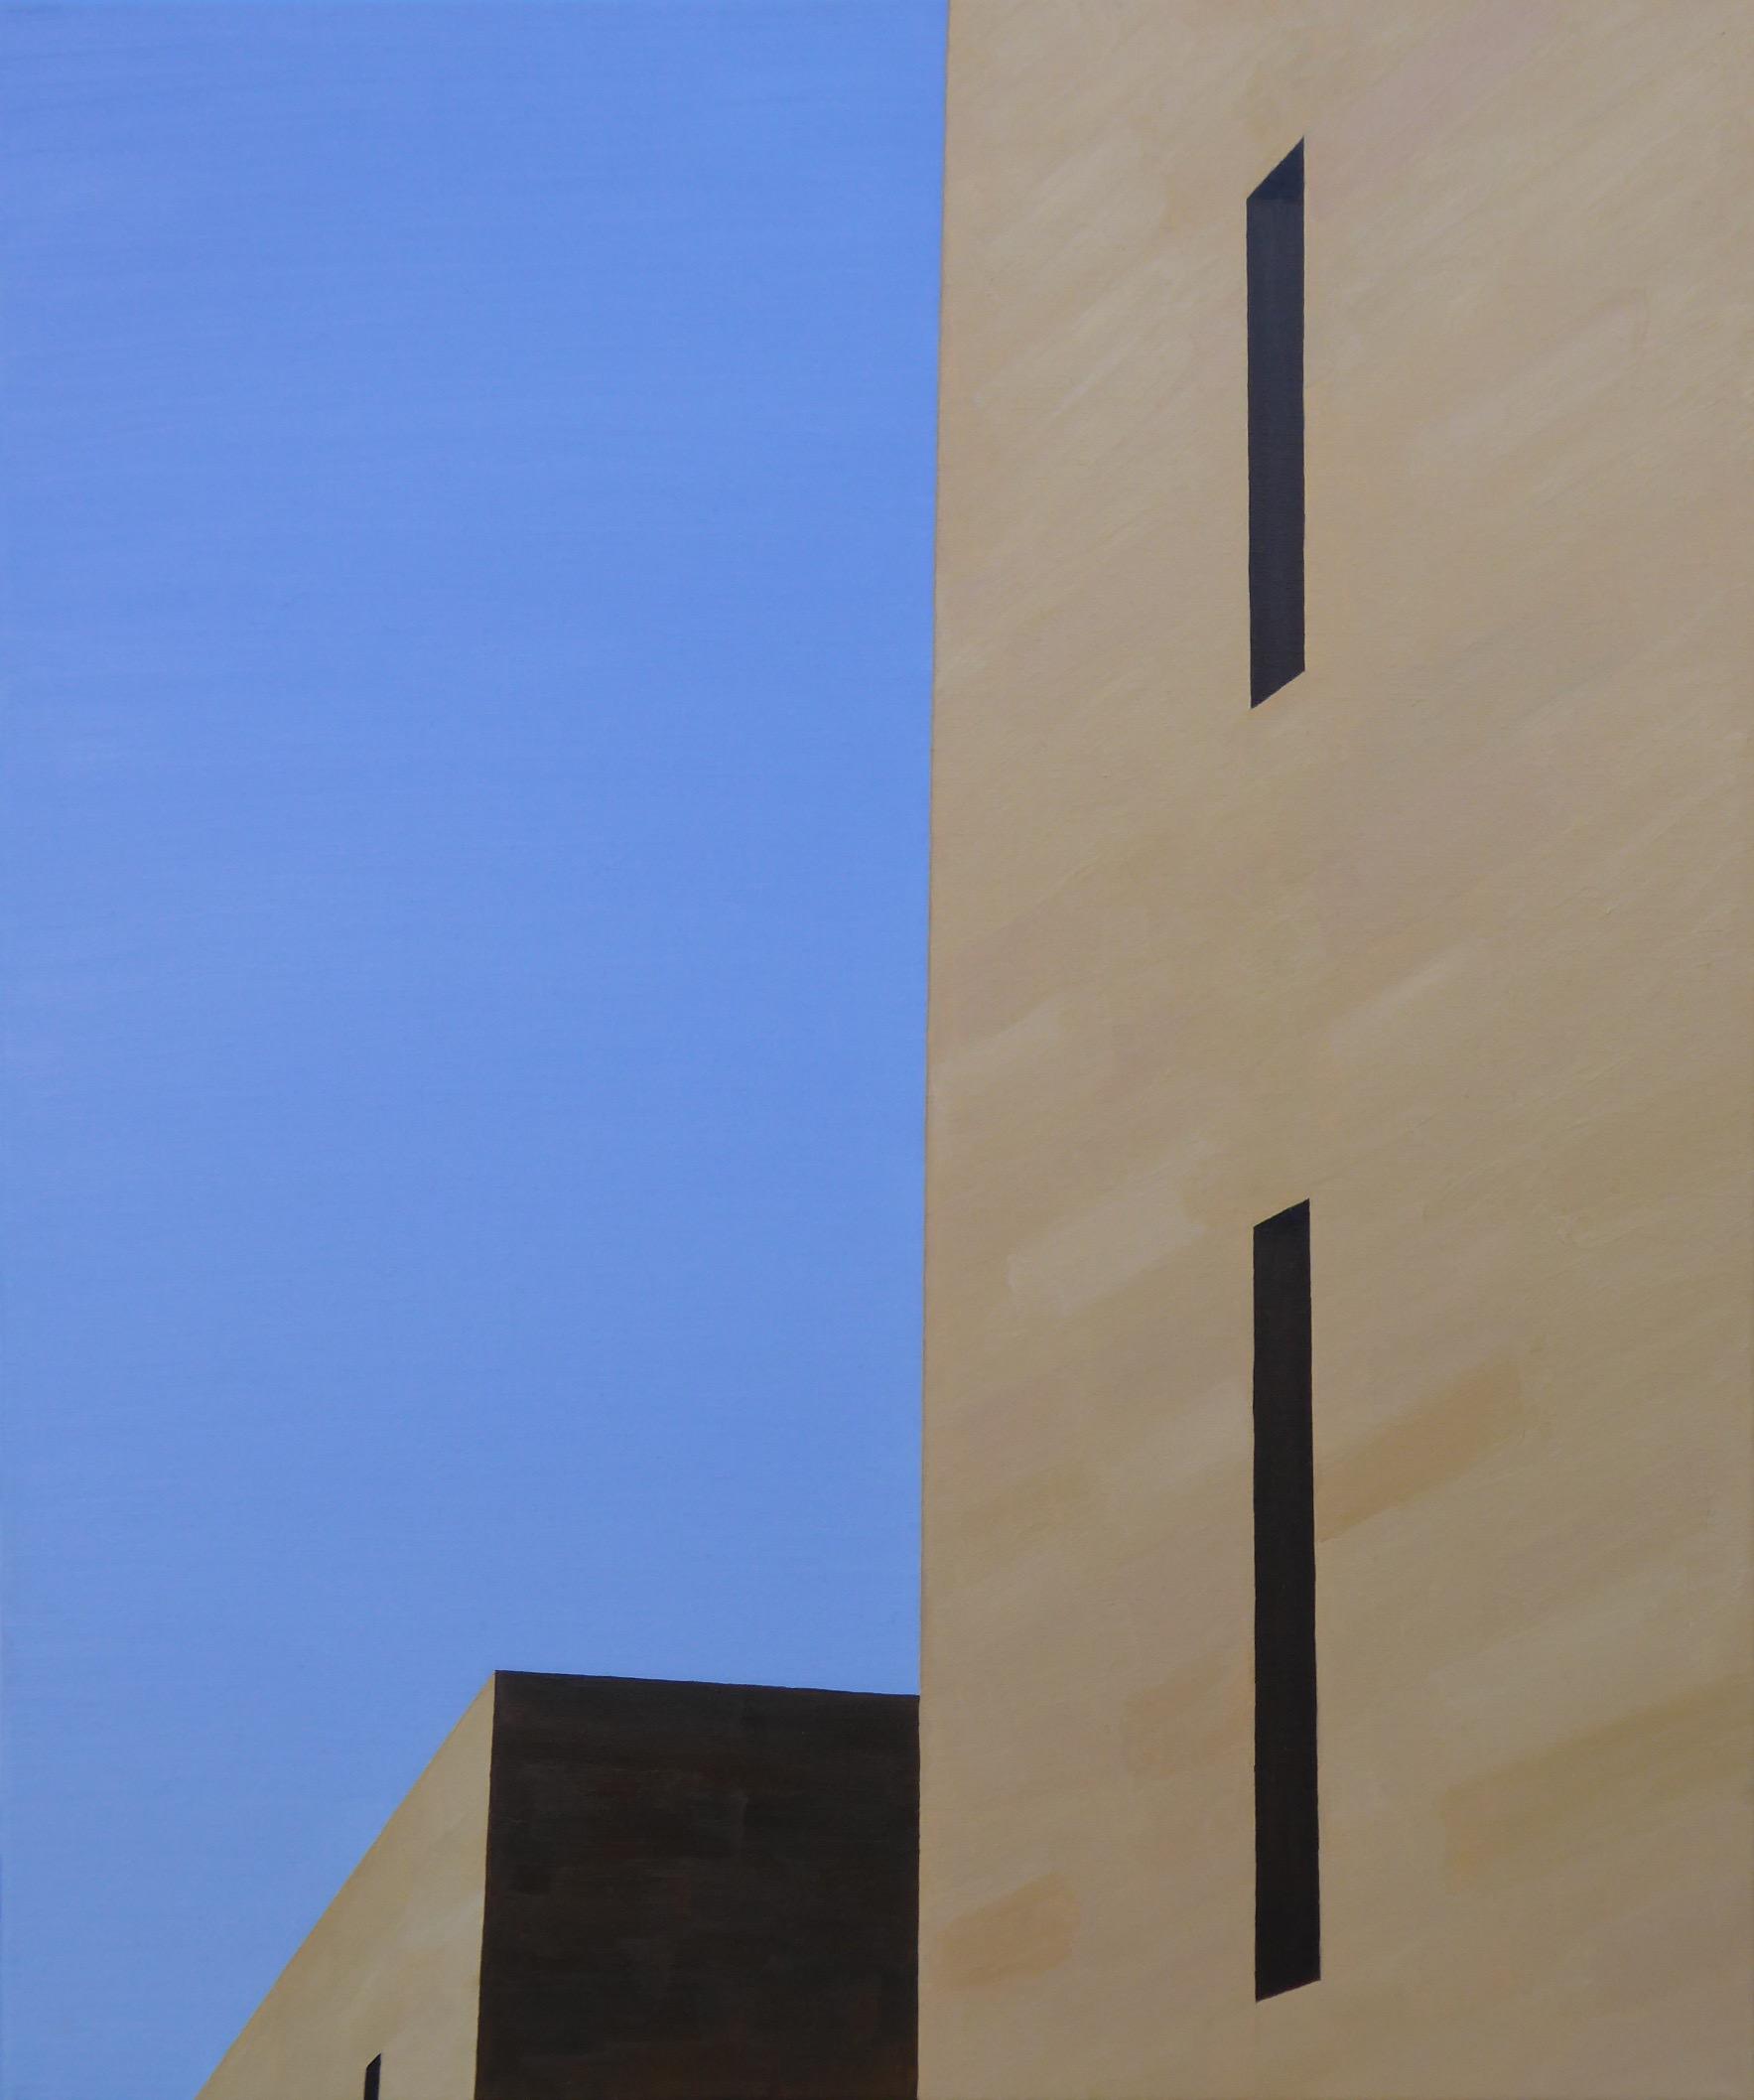 Les Eyzies VIII, olj/duk, 50x61 cm